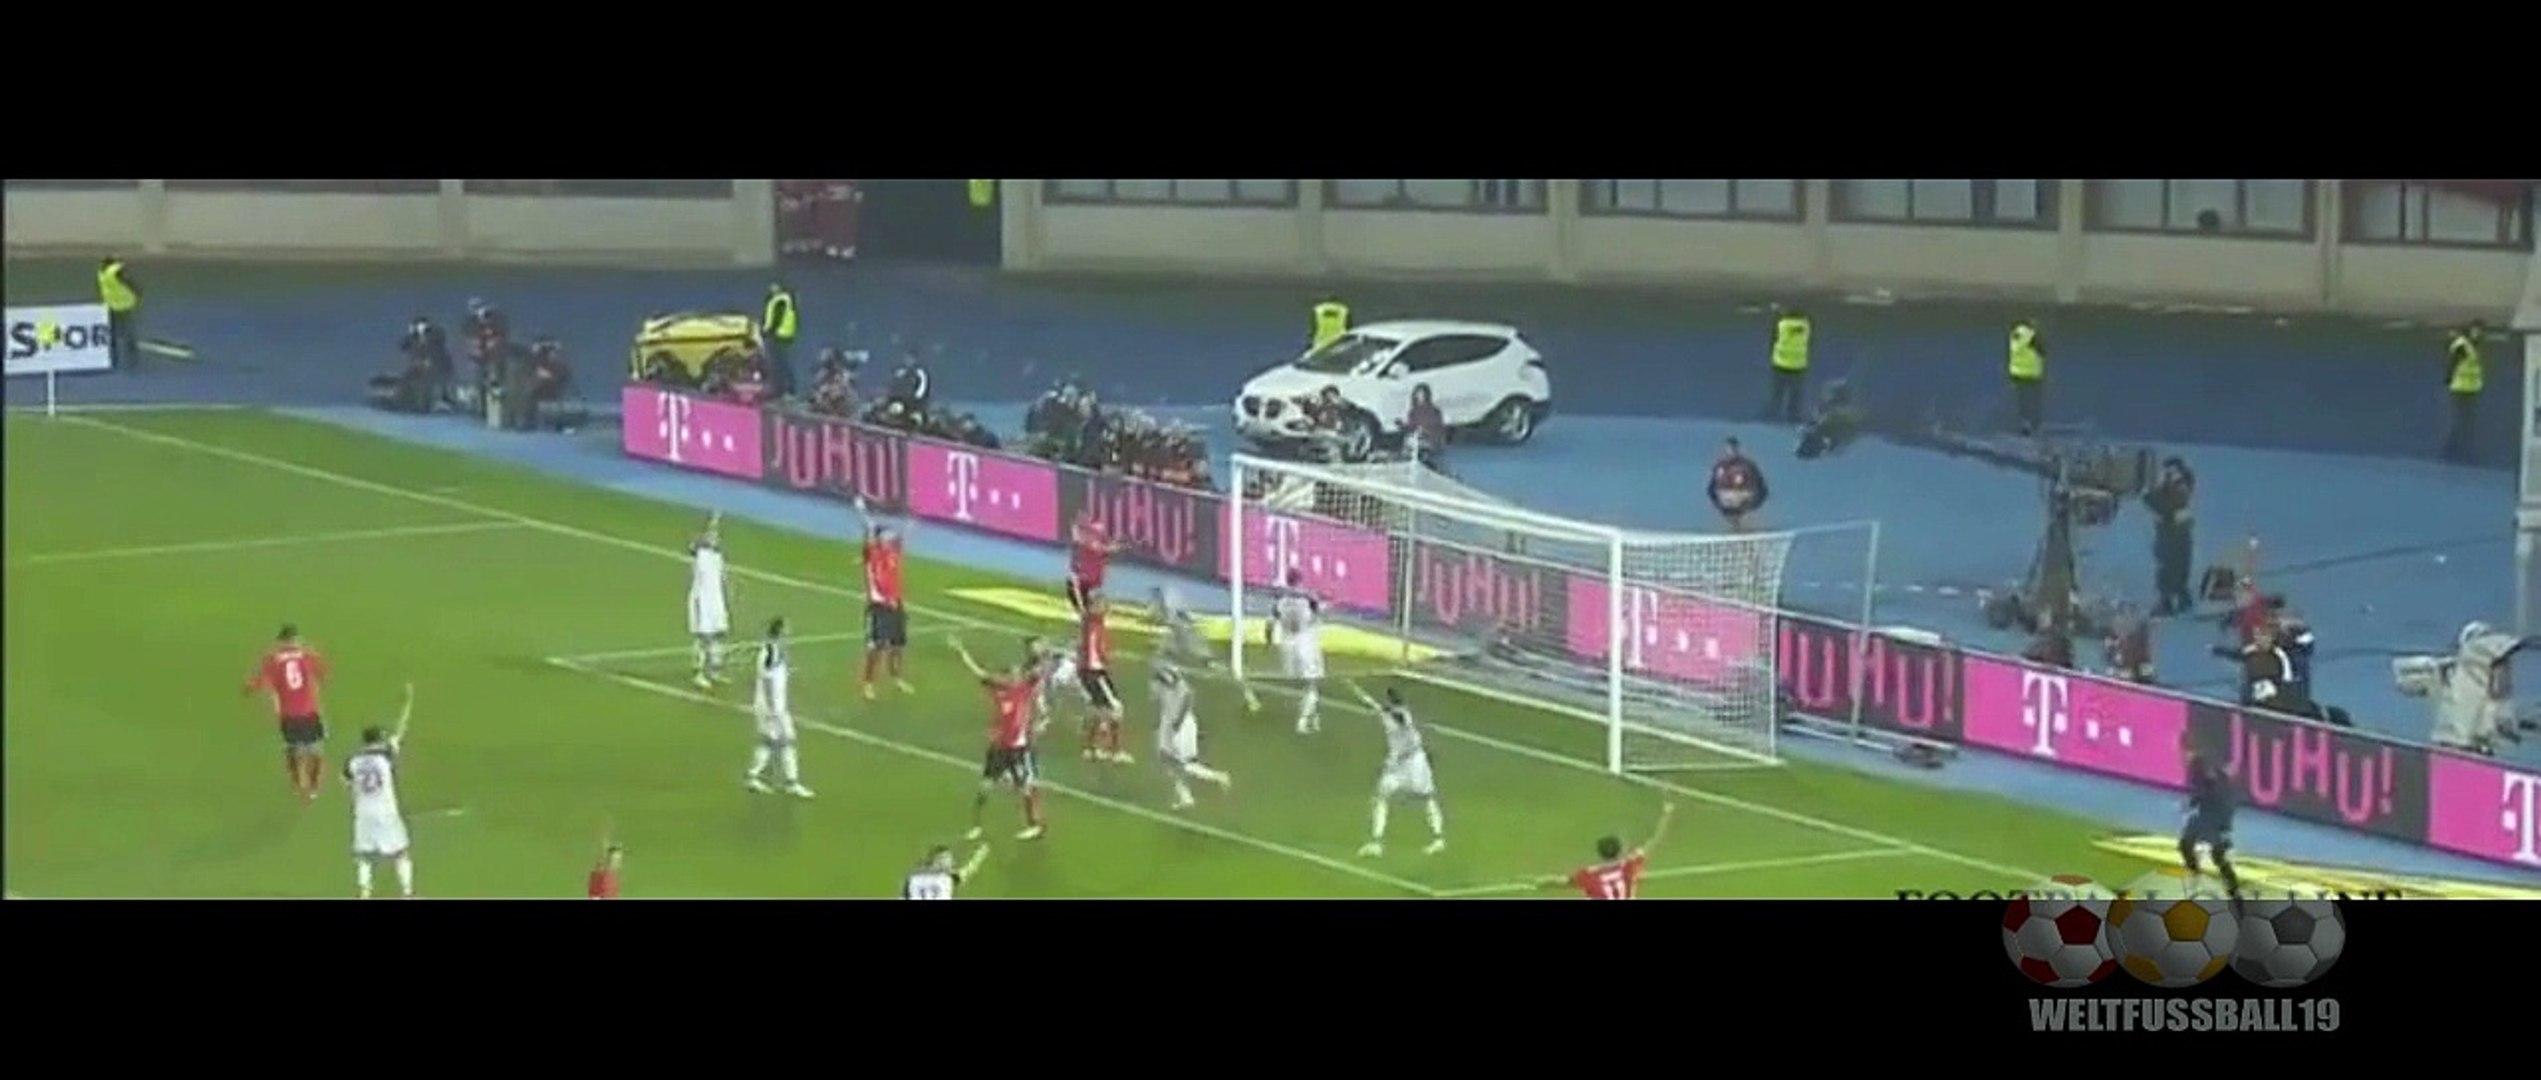 Austria 1 - 0 Russia Goal / Austria 1 - 0 Rusia